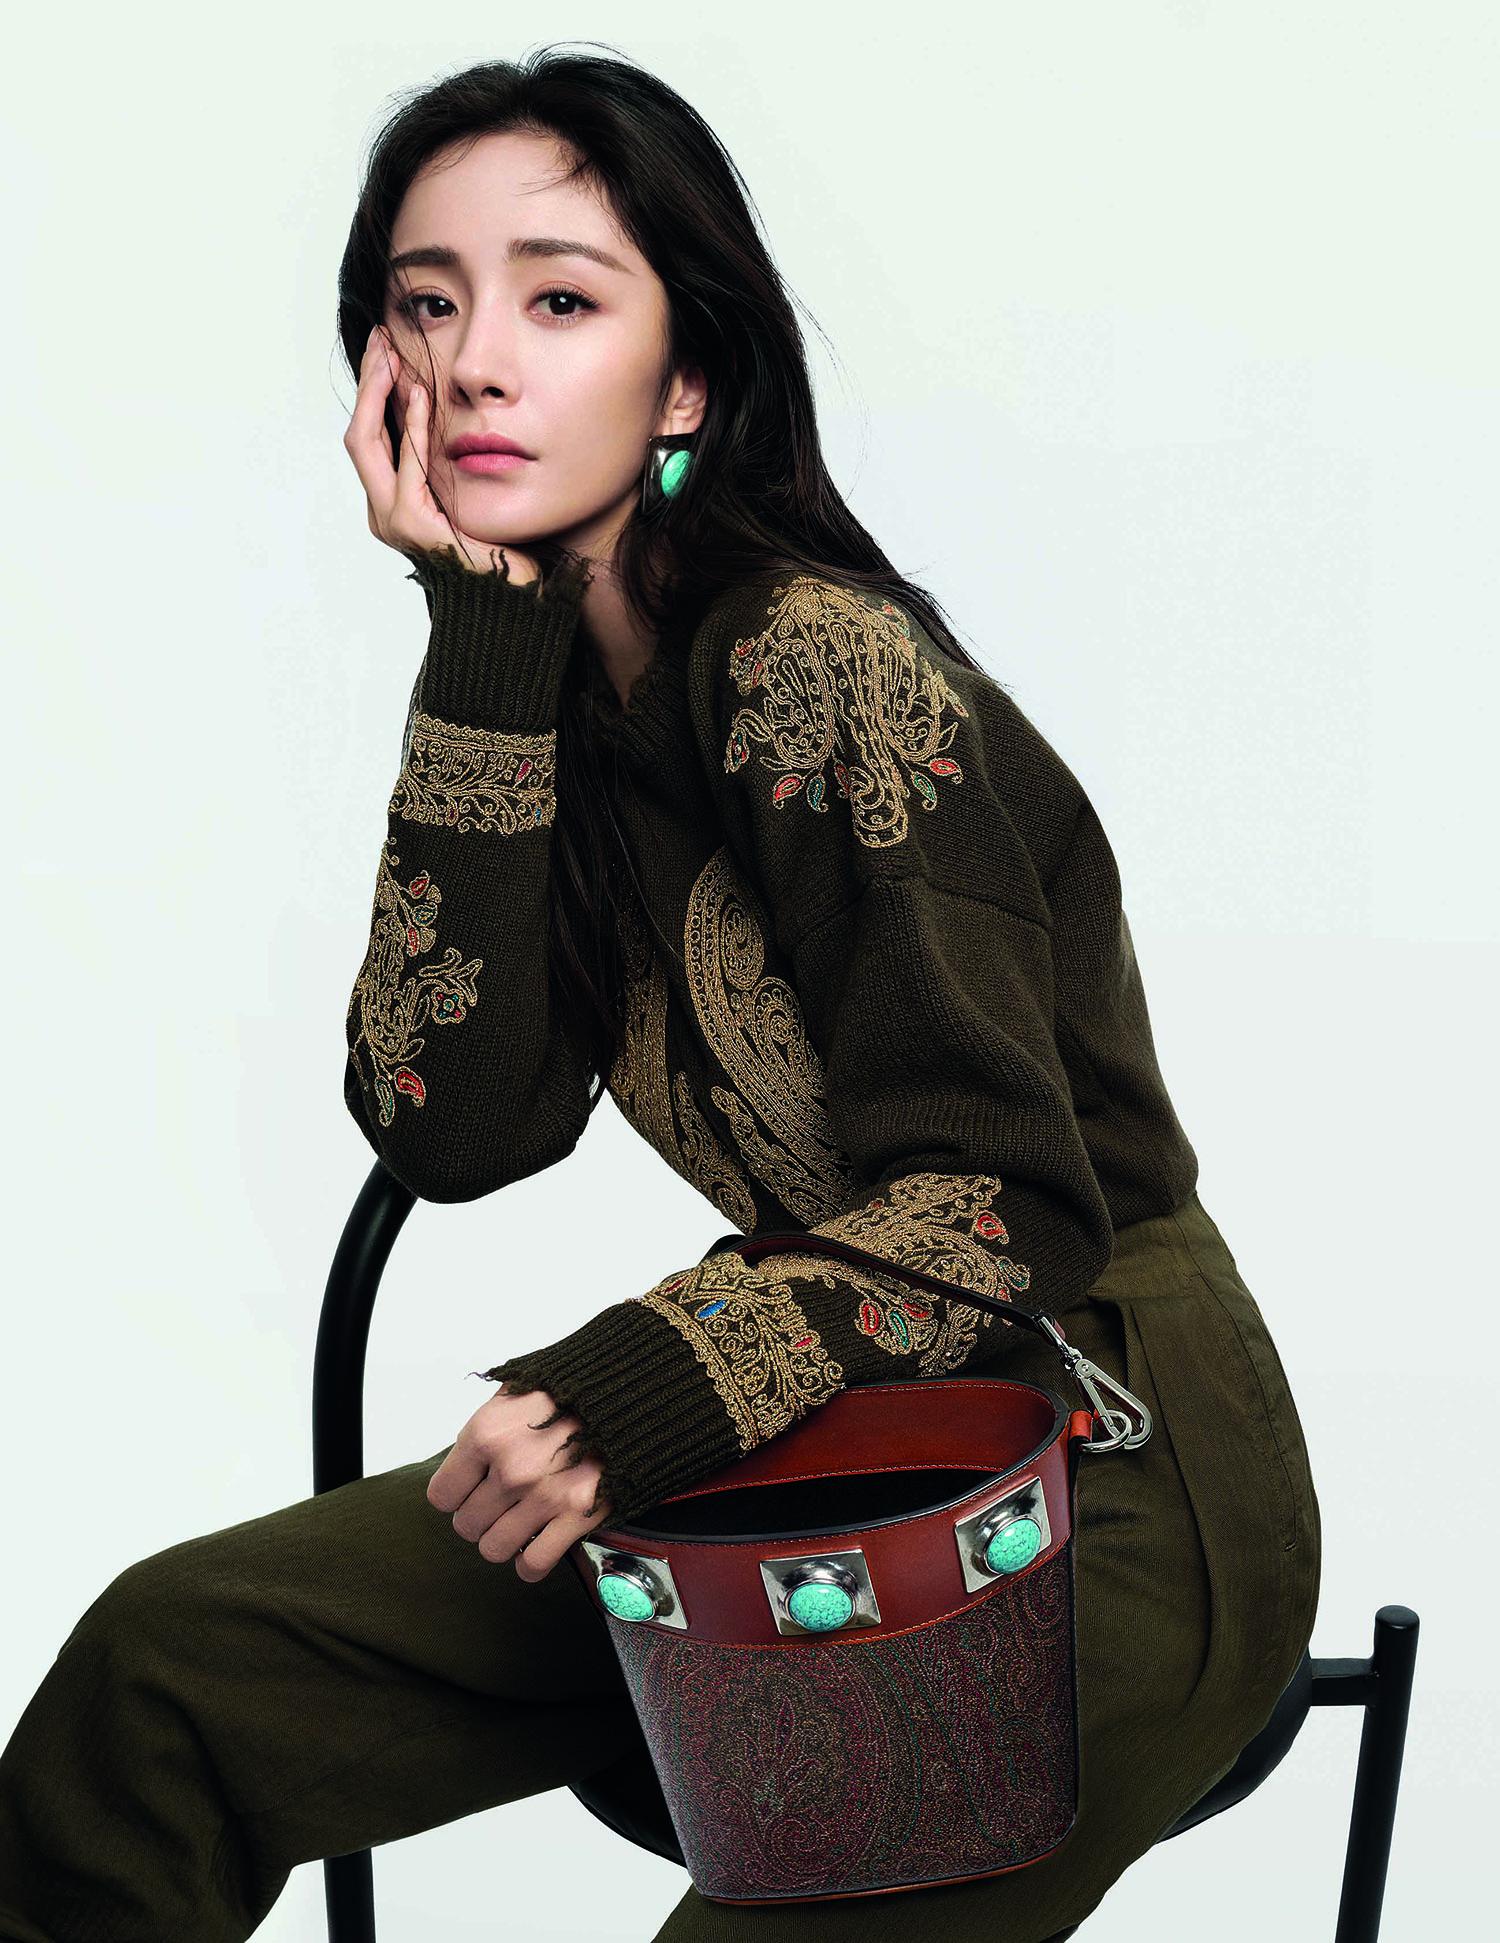 Etro names Yang Mi as its new global ambassador